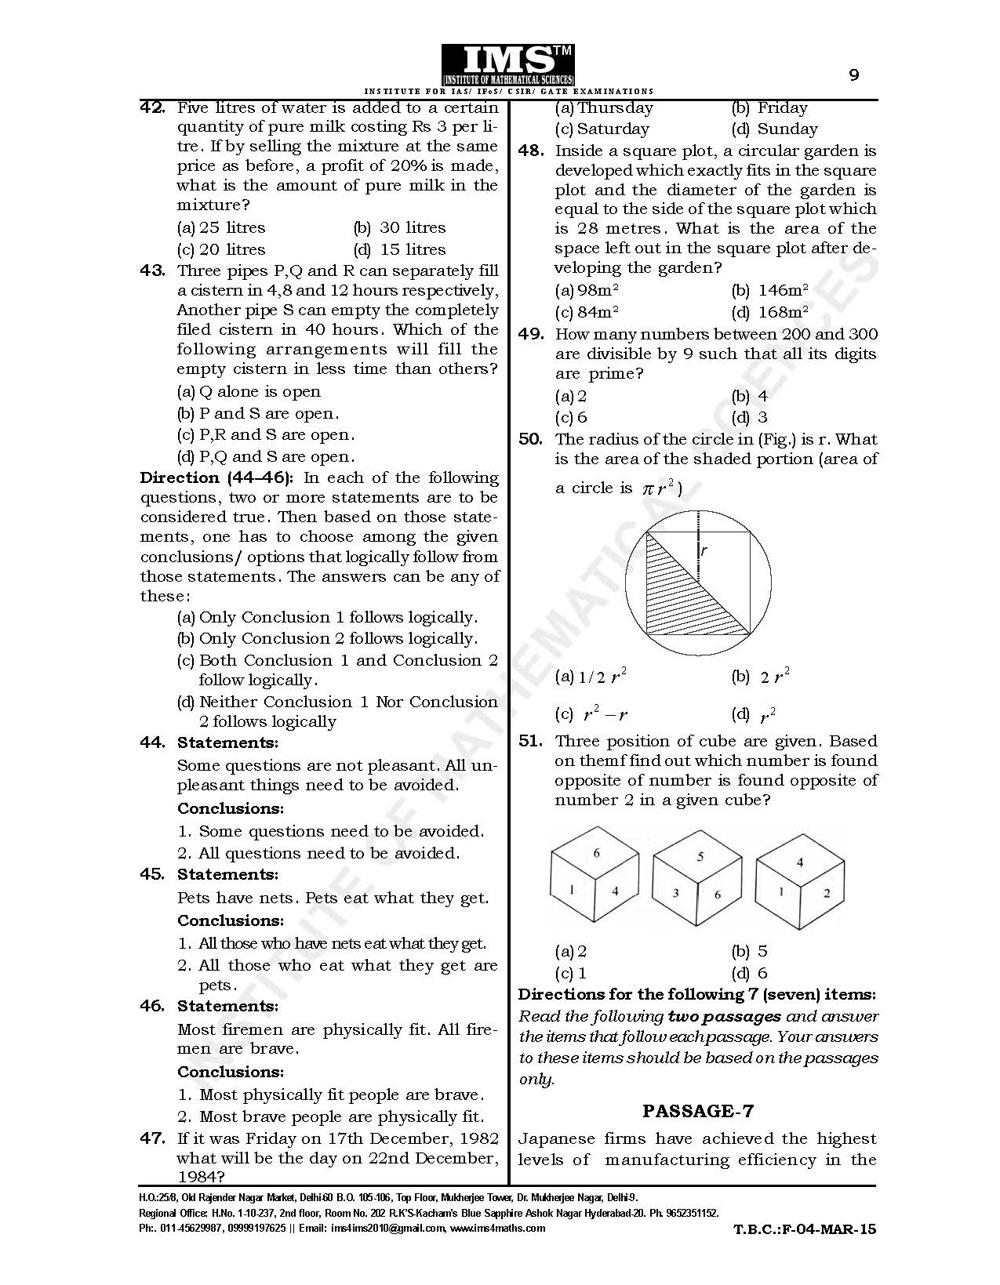 CSAT Test-Series 2015 Free Test Question Paper Page-10